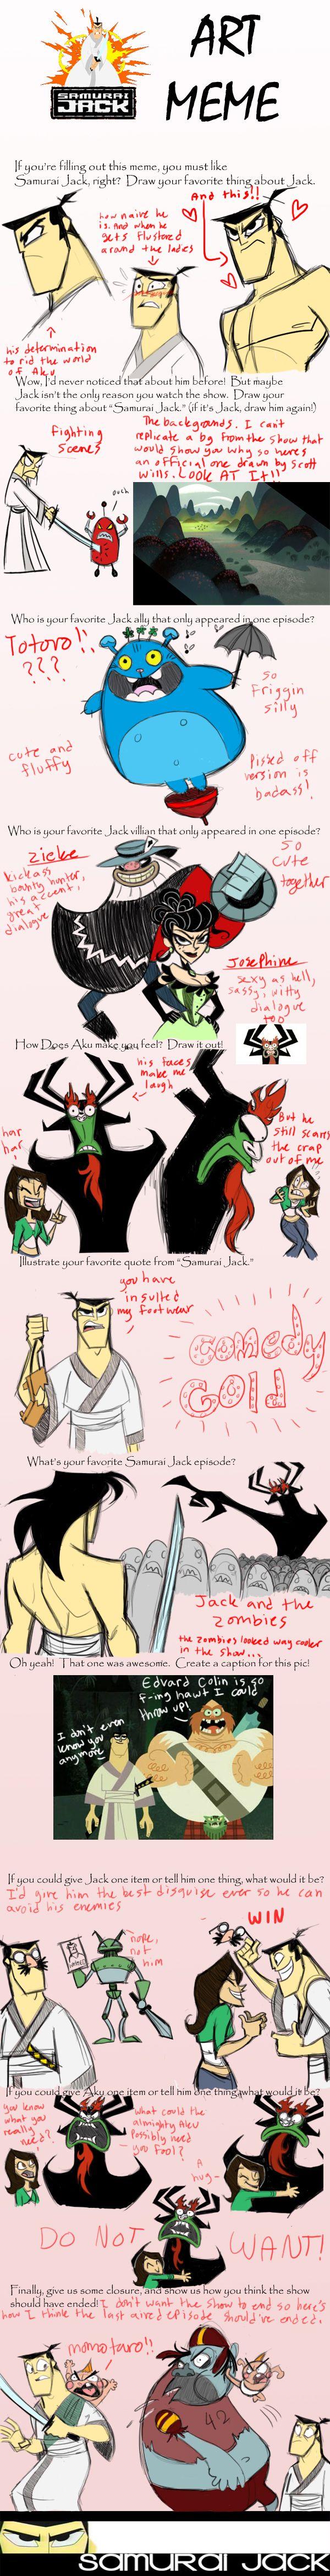 samurai jack meme by Kikoli.deviantart.com on @DeviantArt